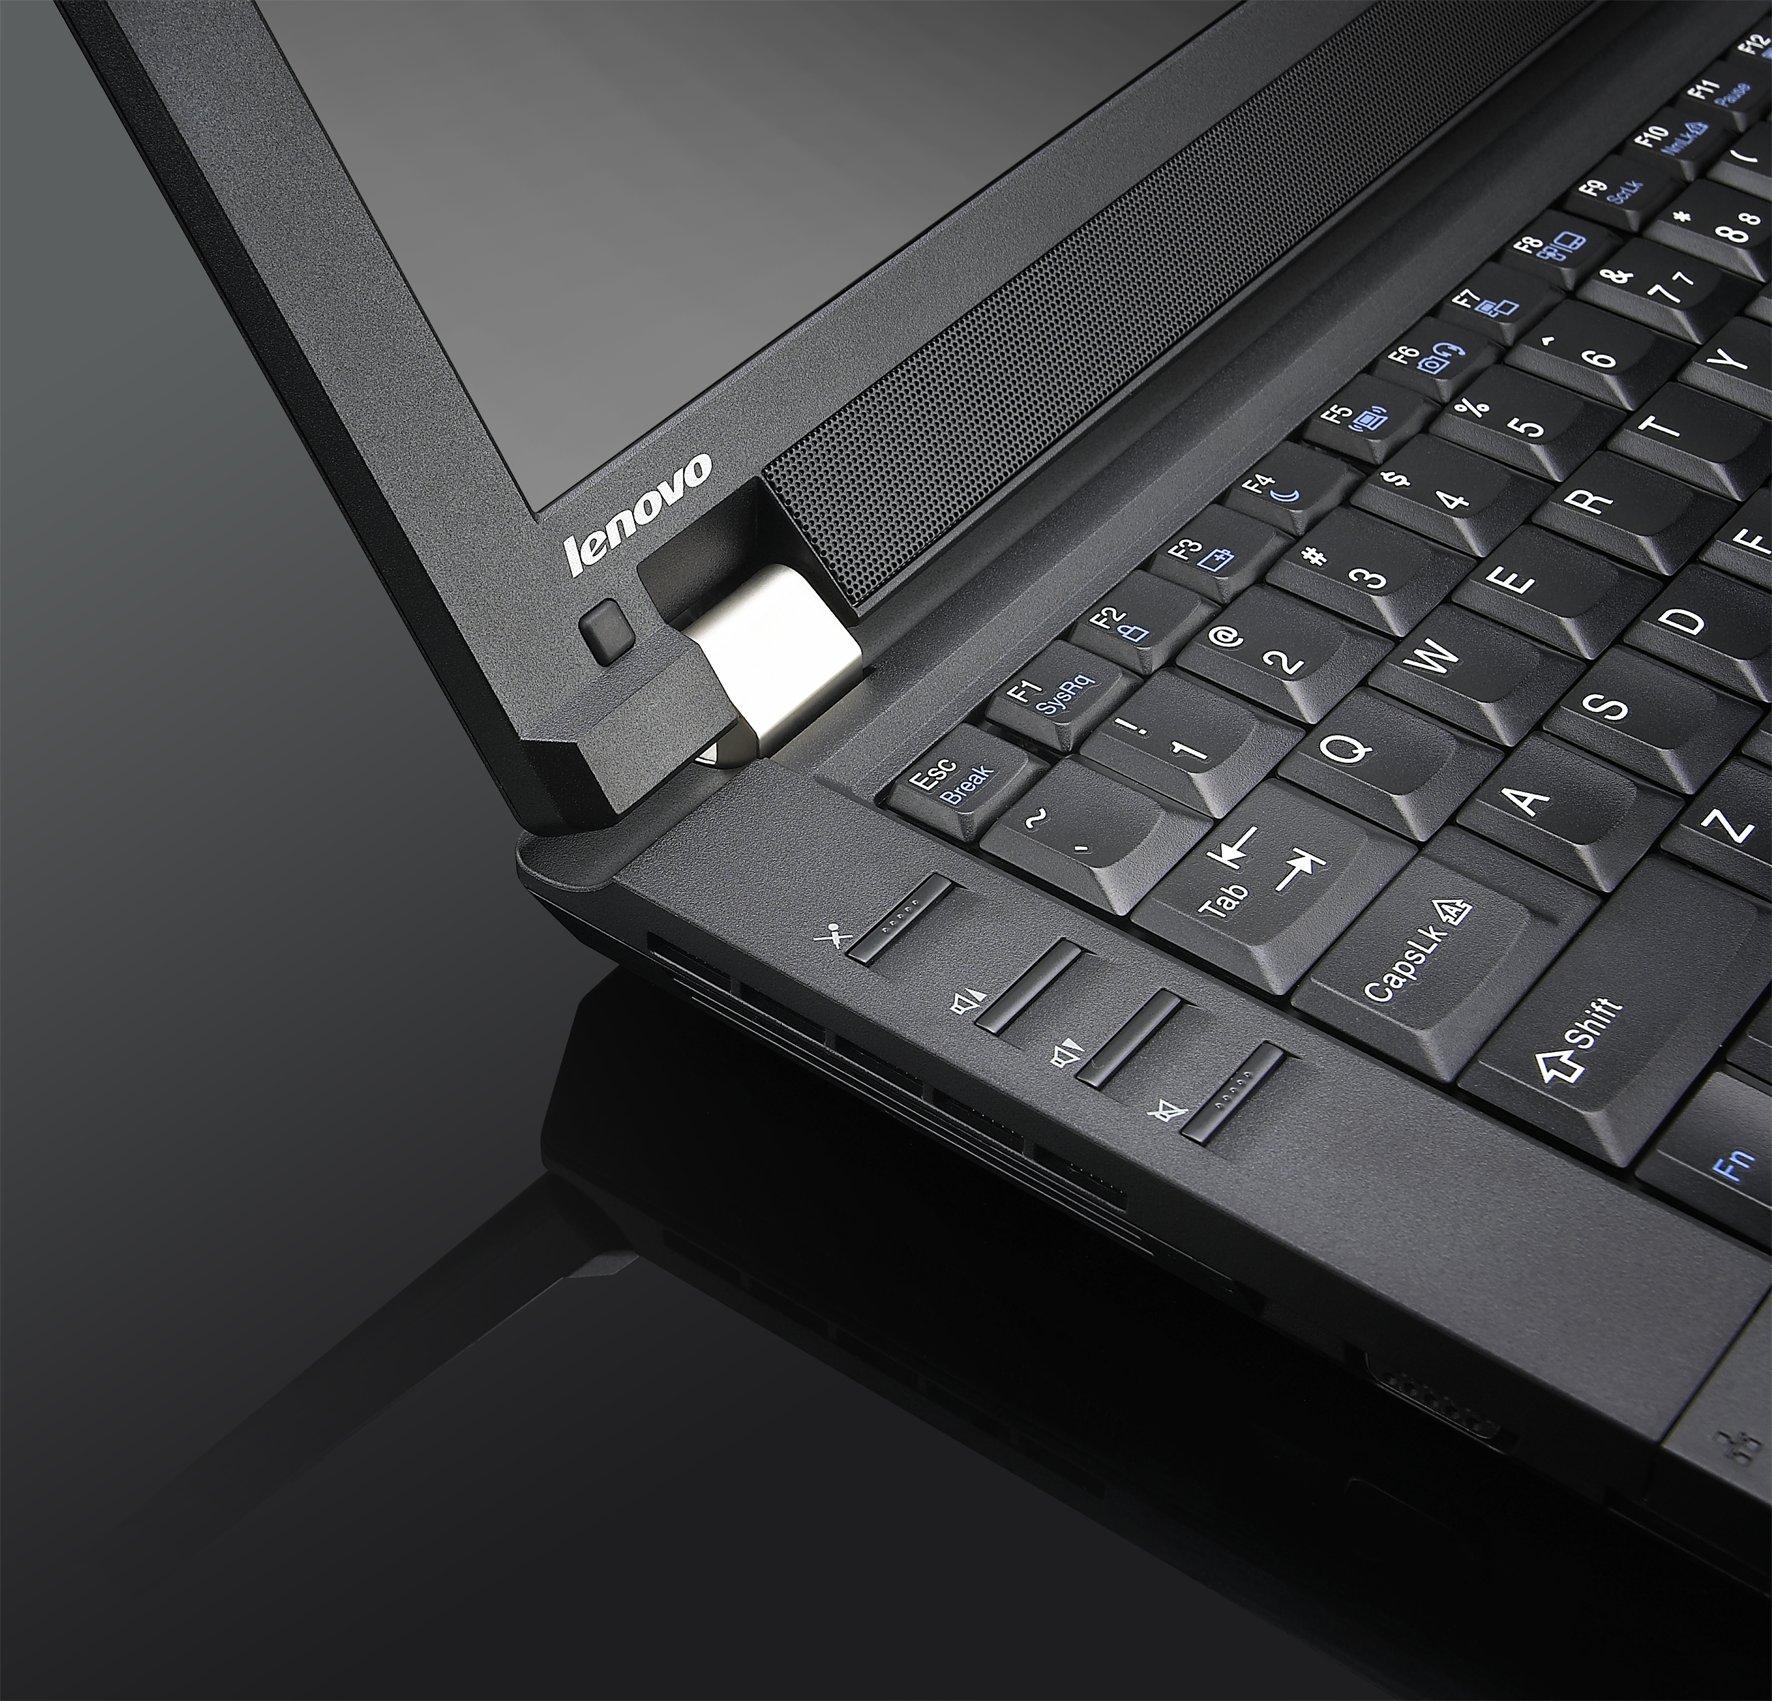 Lenovo ThinkPad L420 Details, Specs and Photos